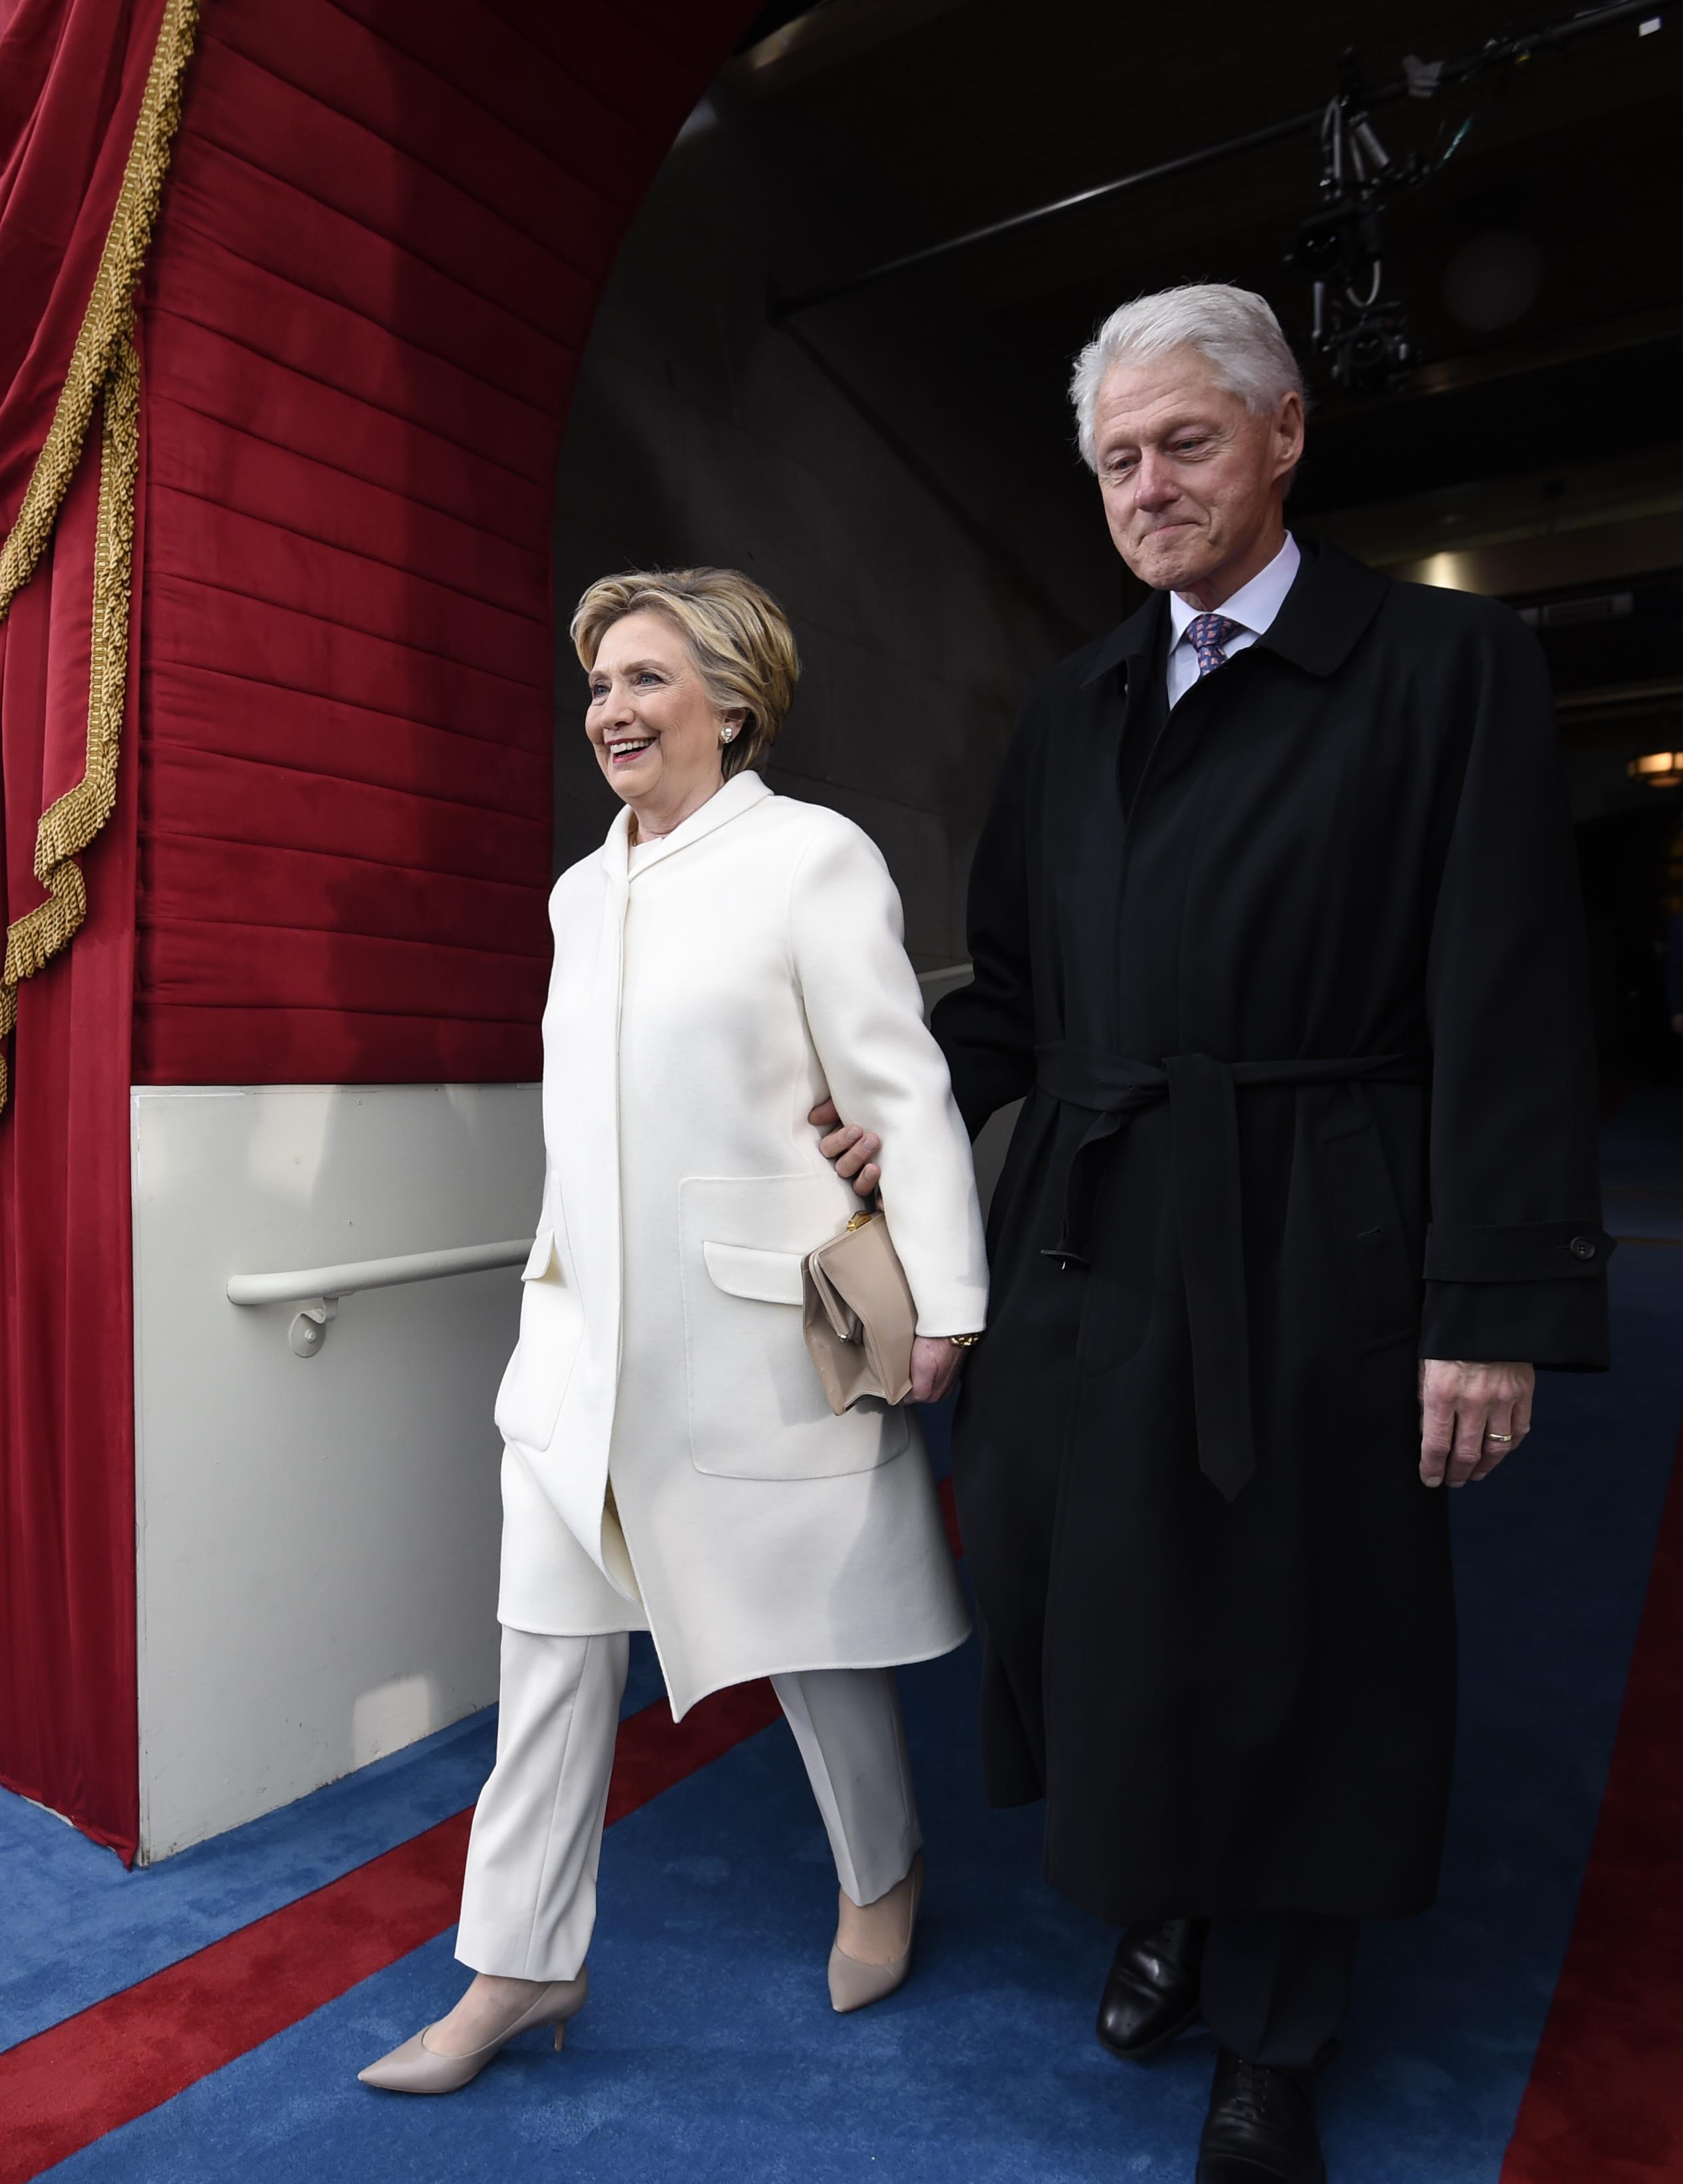 Former President Bill Clinton and his wife Hillary Clinton arrive on Capitol Hill in Washington on Jan. 20, 2017. (Saul Loeb via AP, Pool)